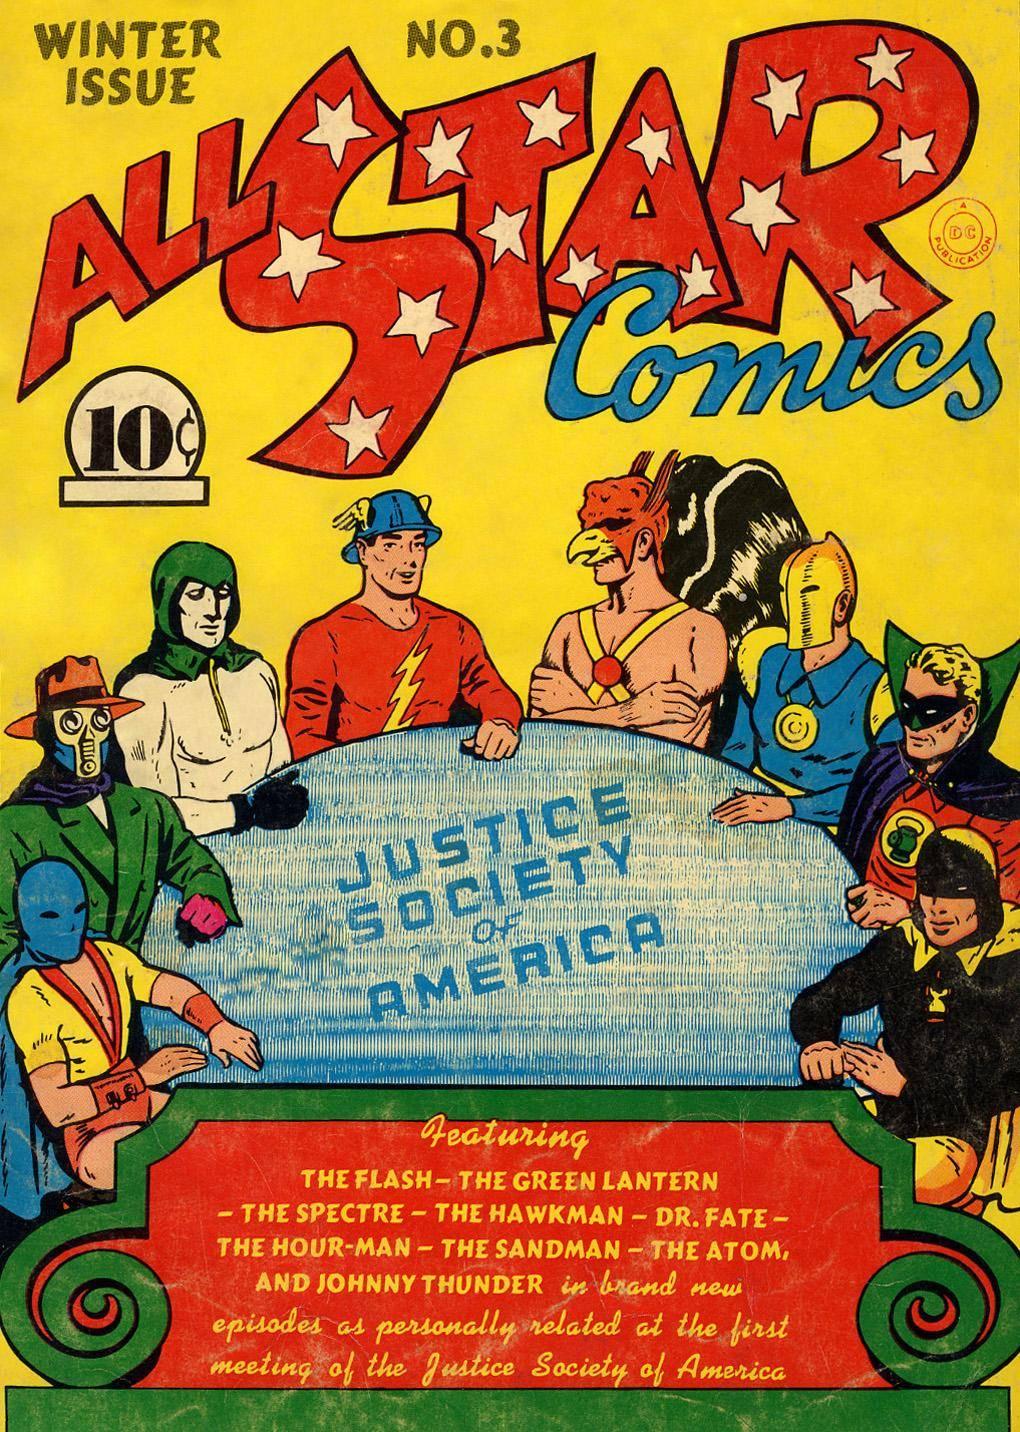 All-Star Comics 003 1940